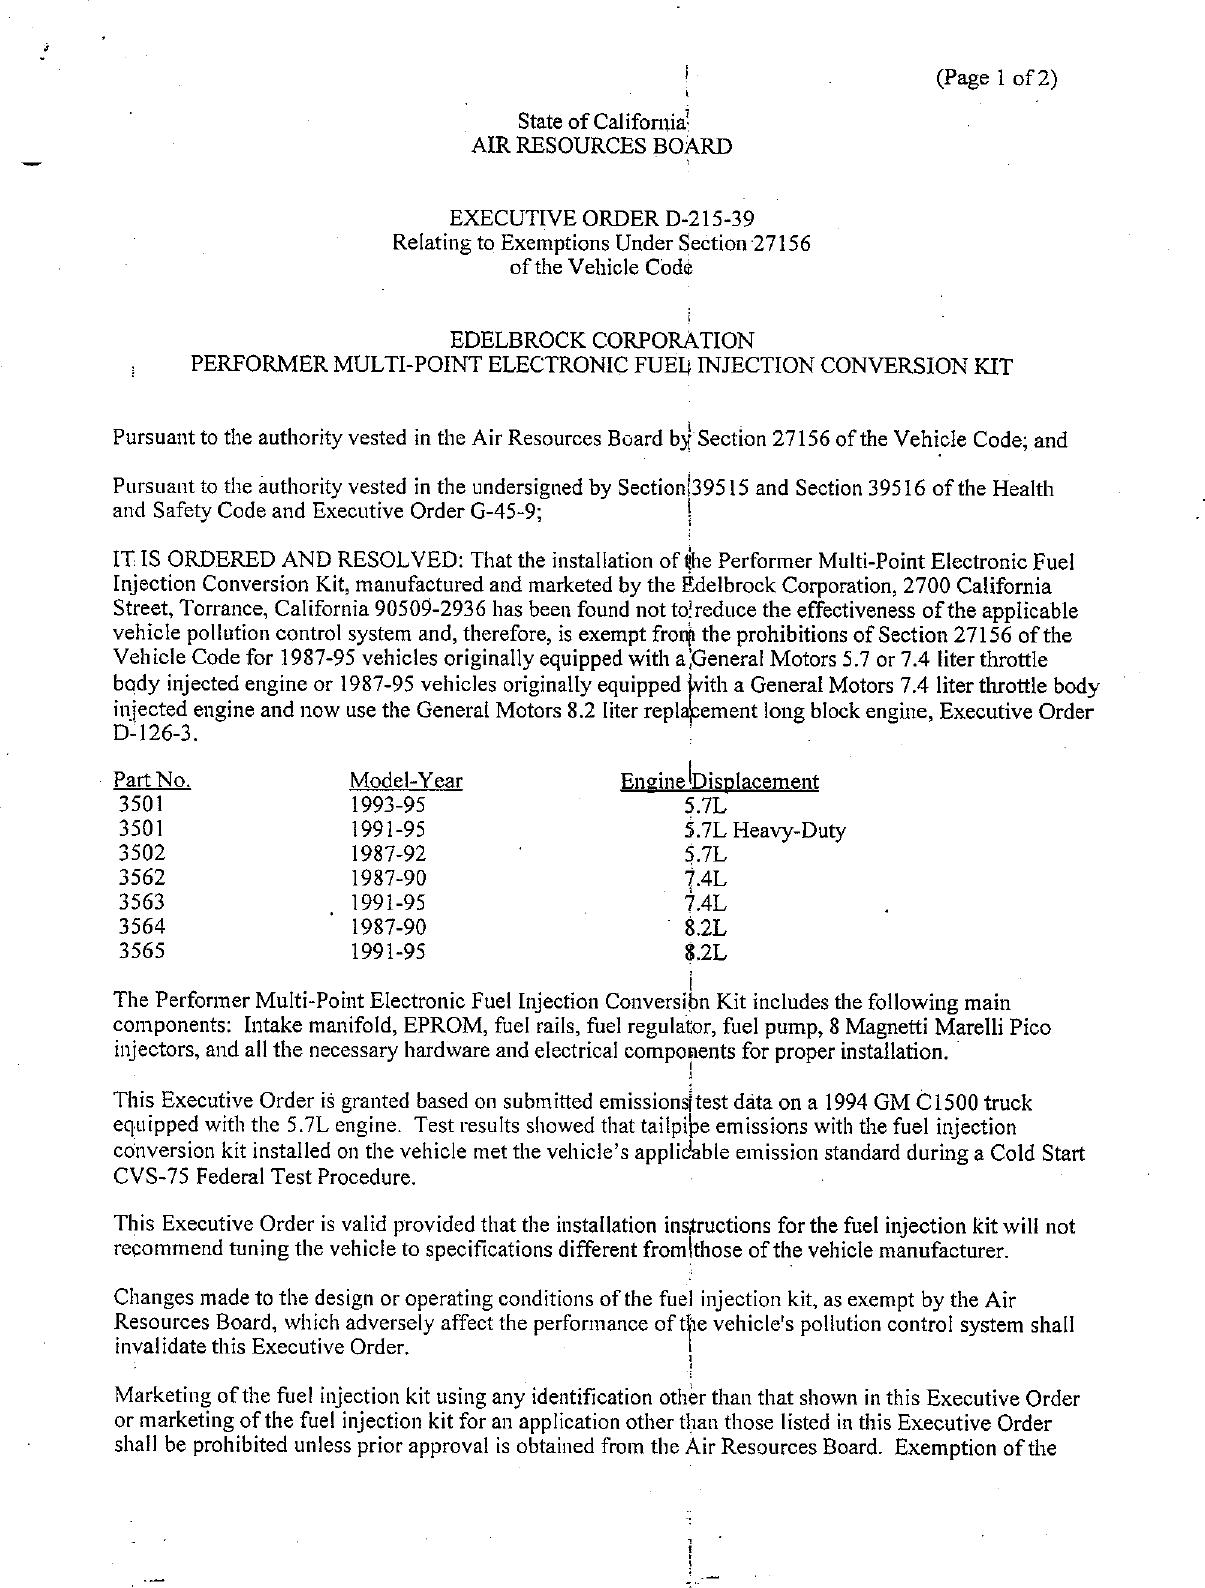 Executive Order D-215-39 Edelbrock